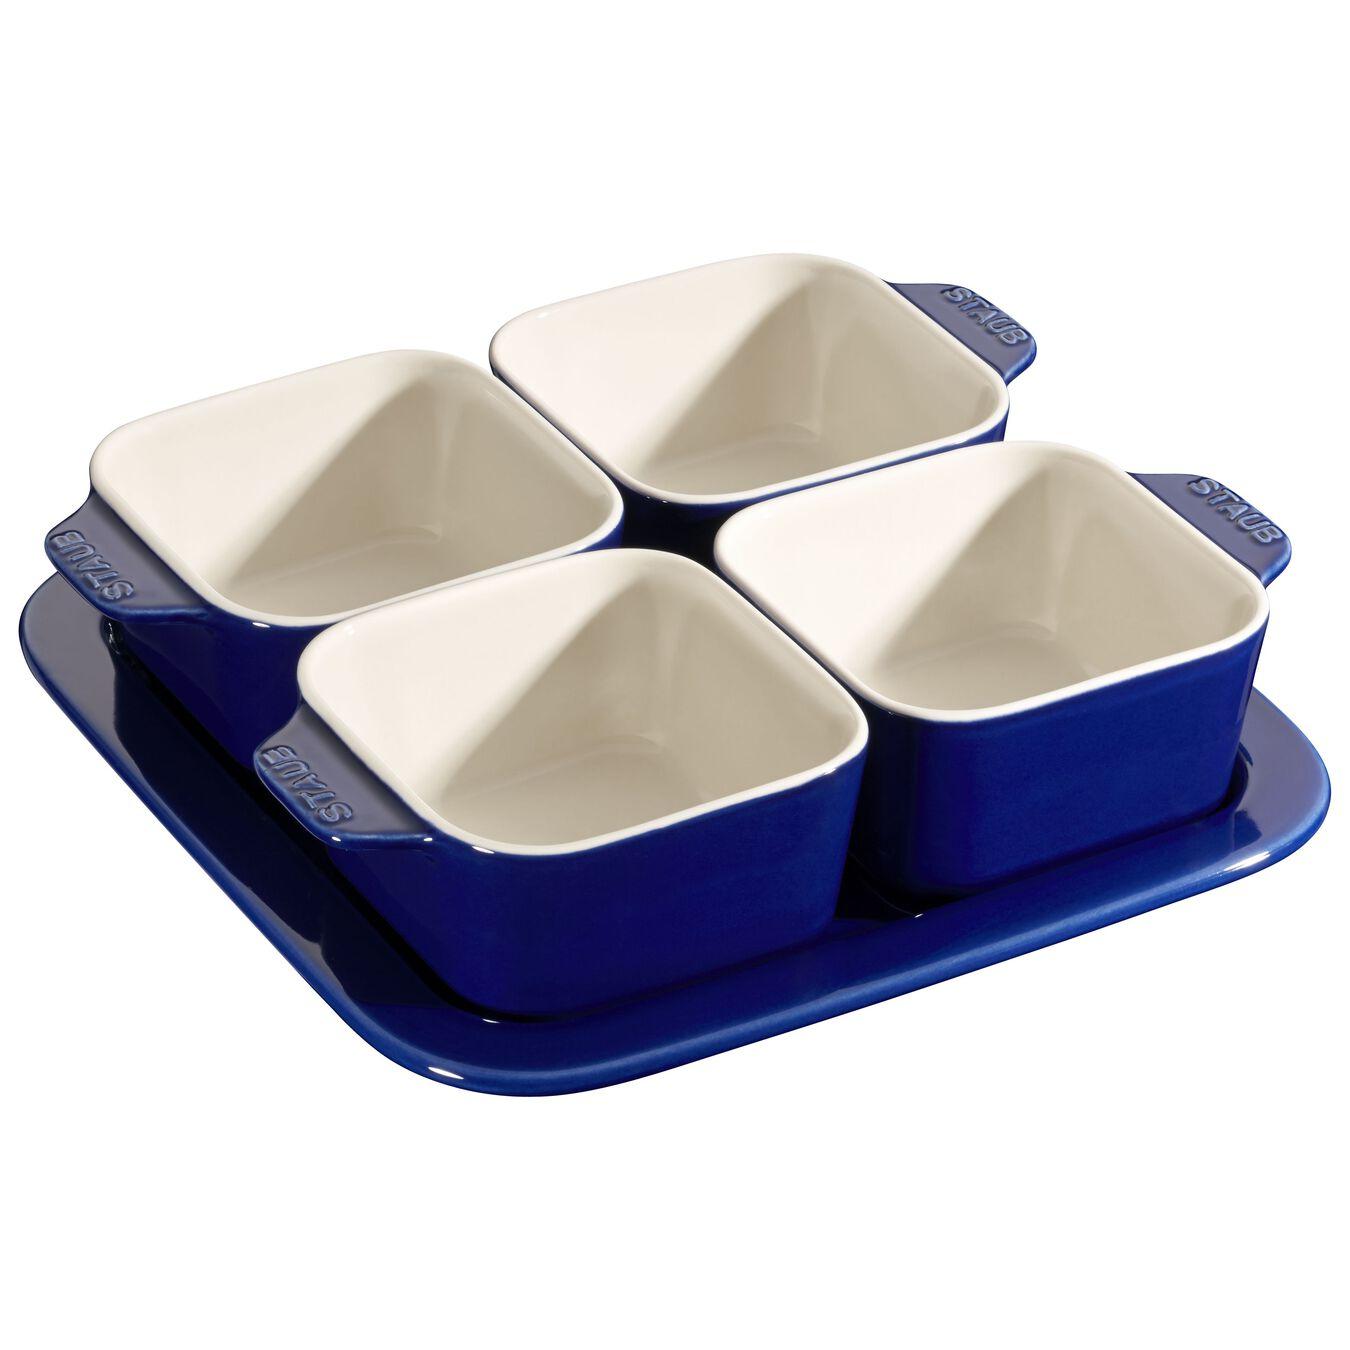 5 Piece Ceramic Appetiser set, Dark-Blue,,large 1